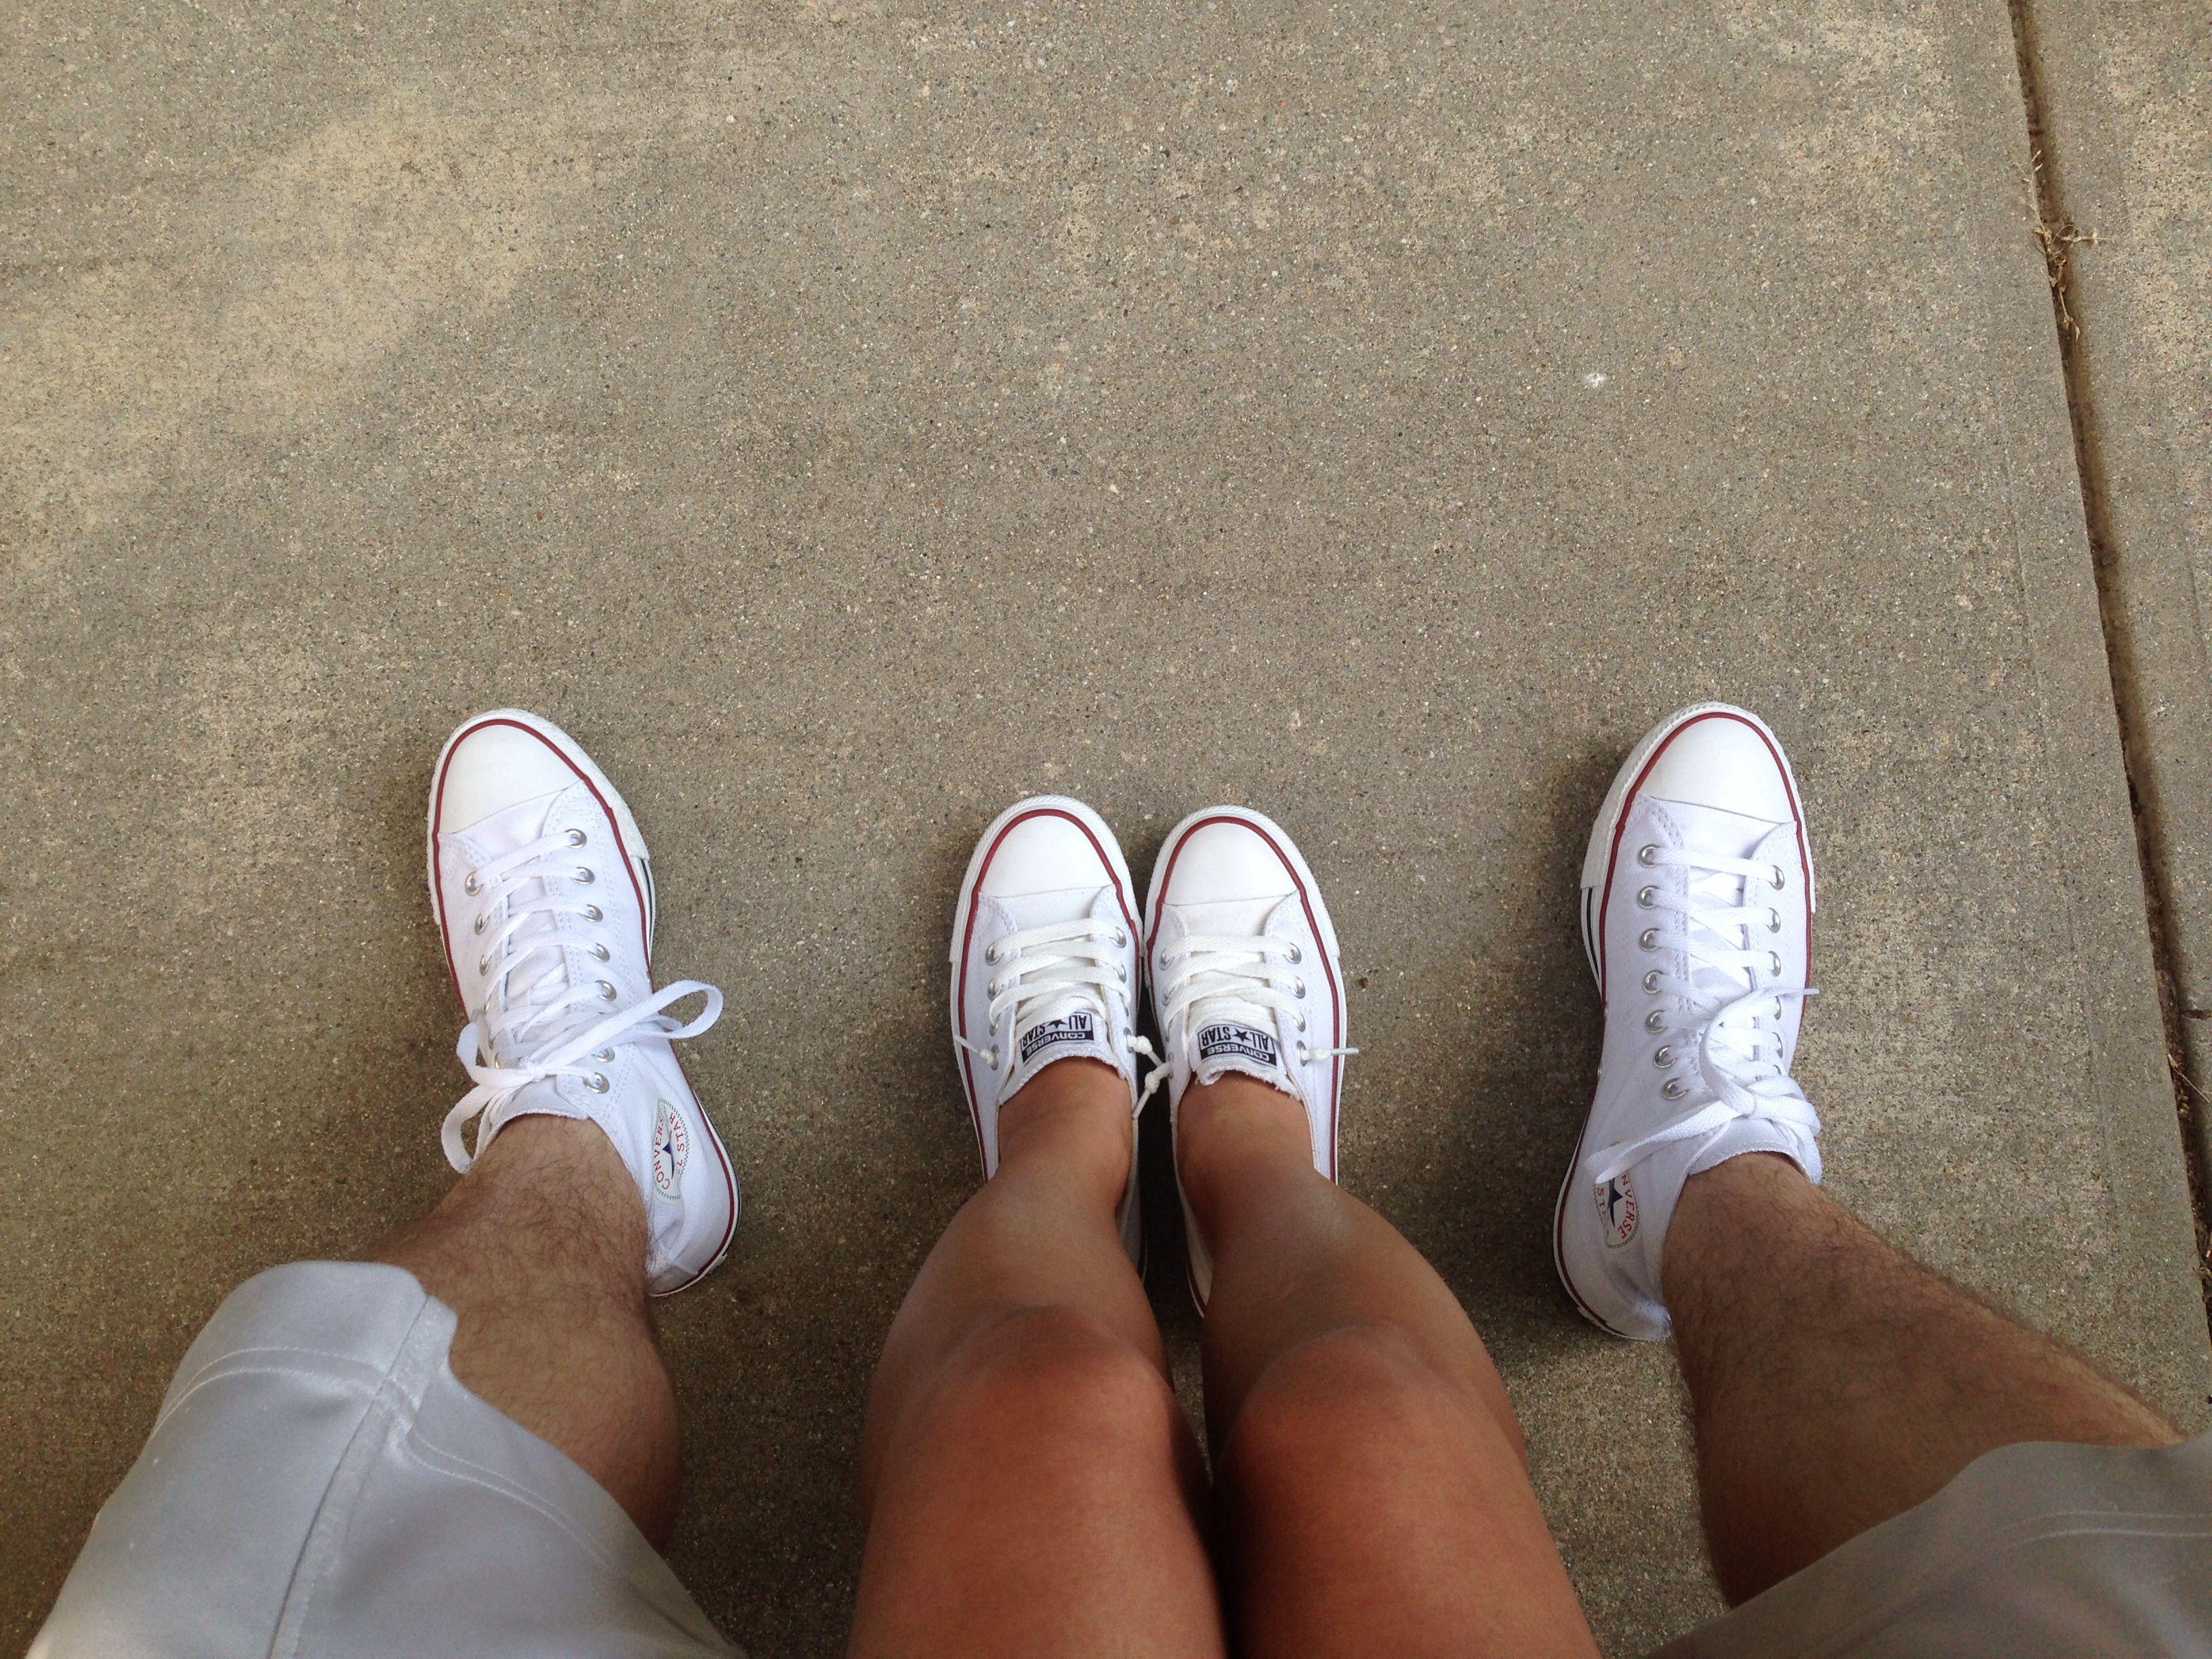 relationship goal met matching converse cute couple